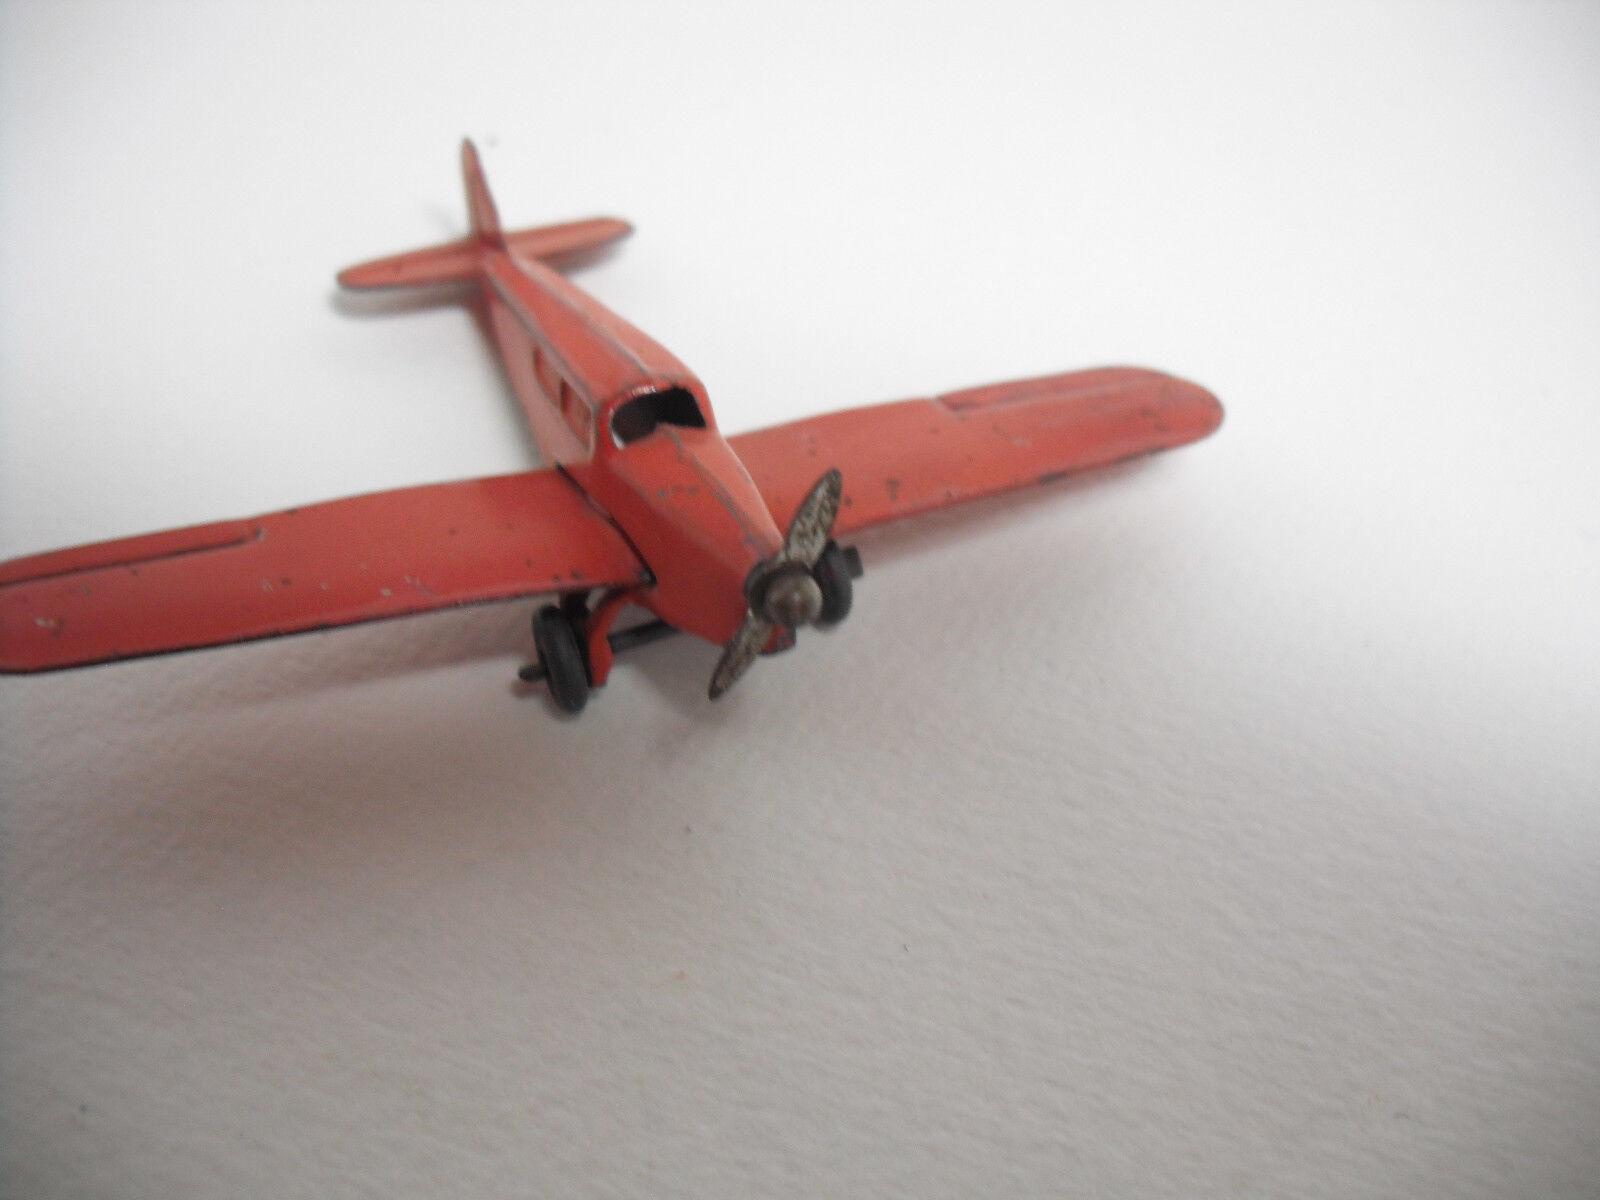 RARE Dinky Toys Meccano K PERCIVAL GULL, GULL, GULL,  EXCELLENT CONDITION  1946 POSTWAR 656e89